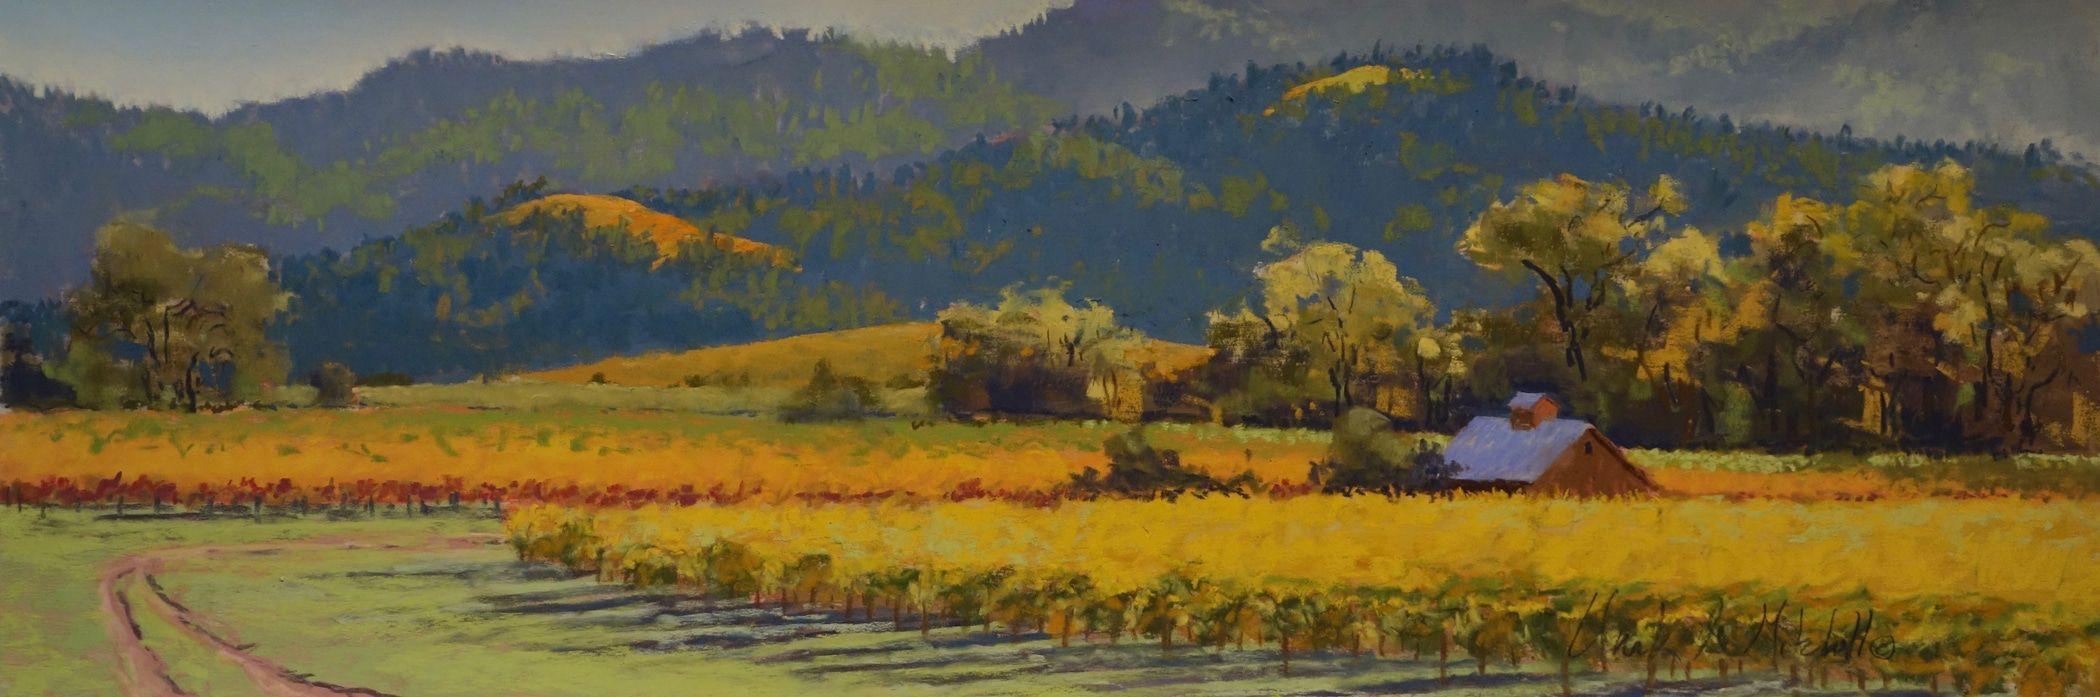 PleinAir Podcast Episode 114 Clark Mitchell on Painting